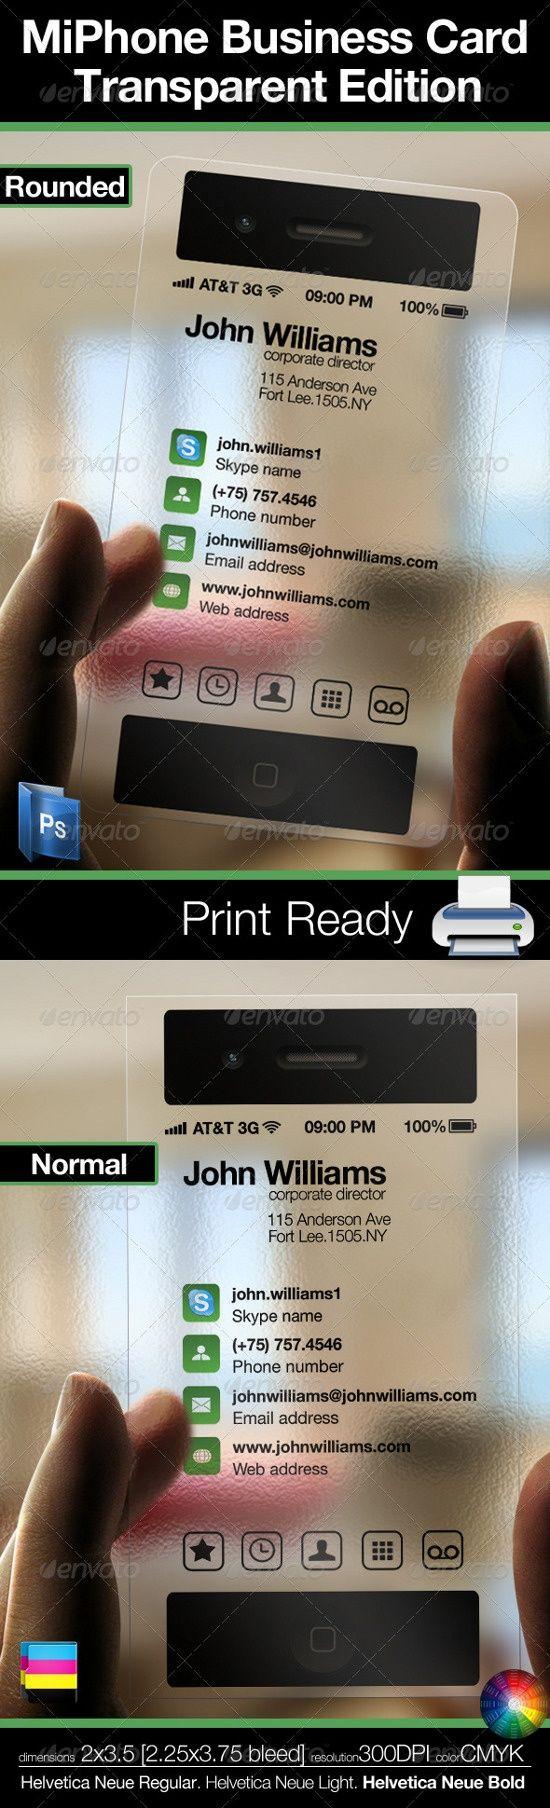 110 best Business Card + Tarjeta images on Pinterest | Business card ...